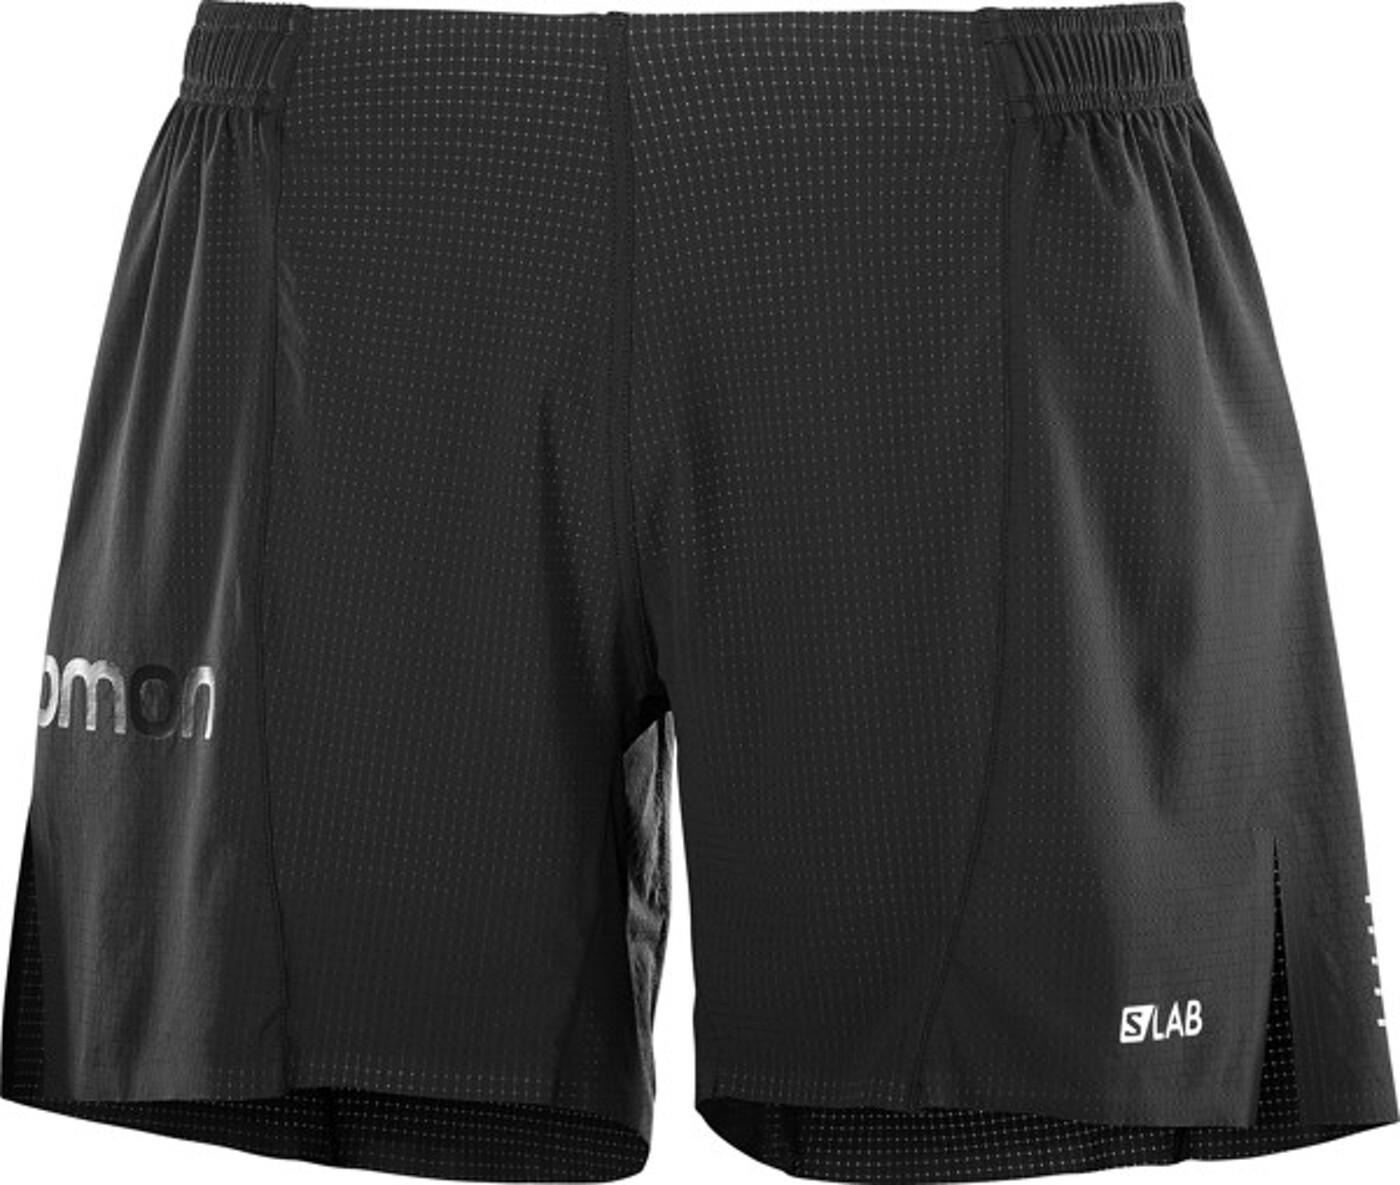 SALOMON S/LAB OUTER 6 - Shorts - Herren